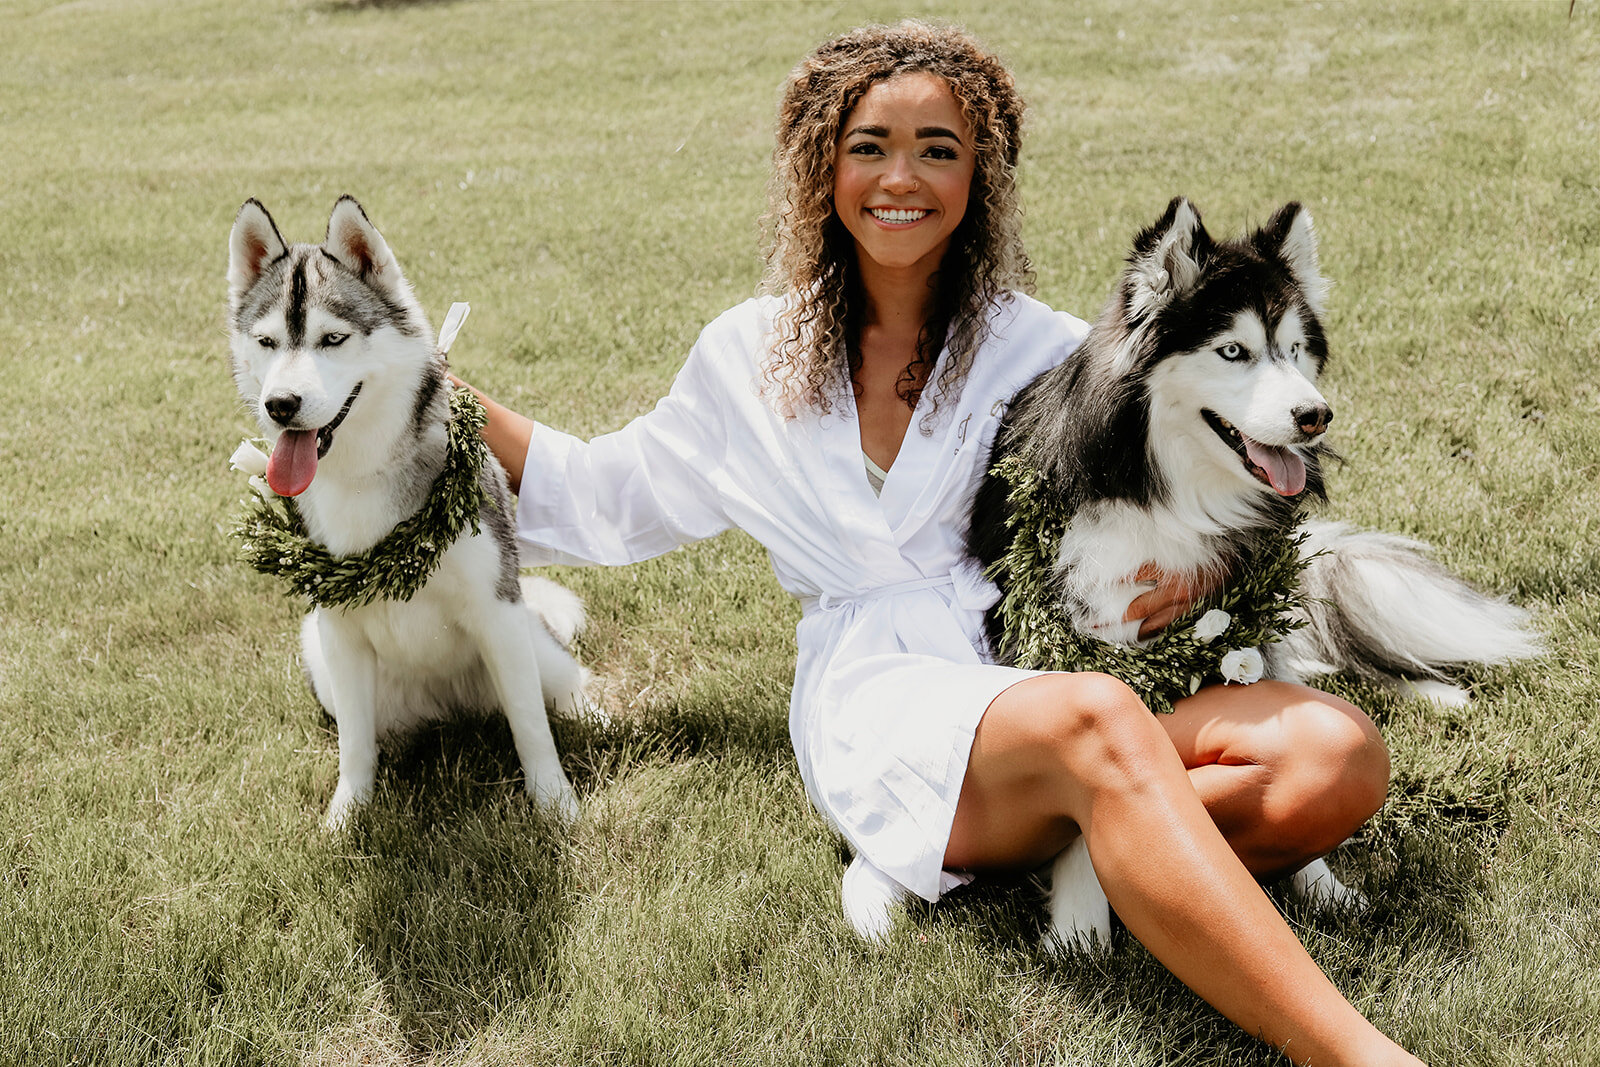 august-wolf-floral-design-des-moines-ia-ames-wedding-florist-huskies-flower-collar-wreath-crown-bride.jpg